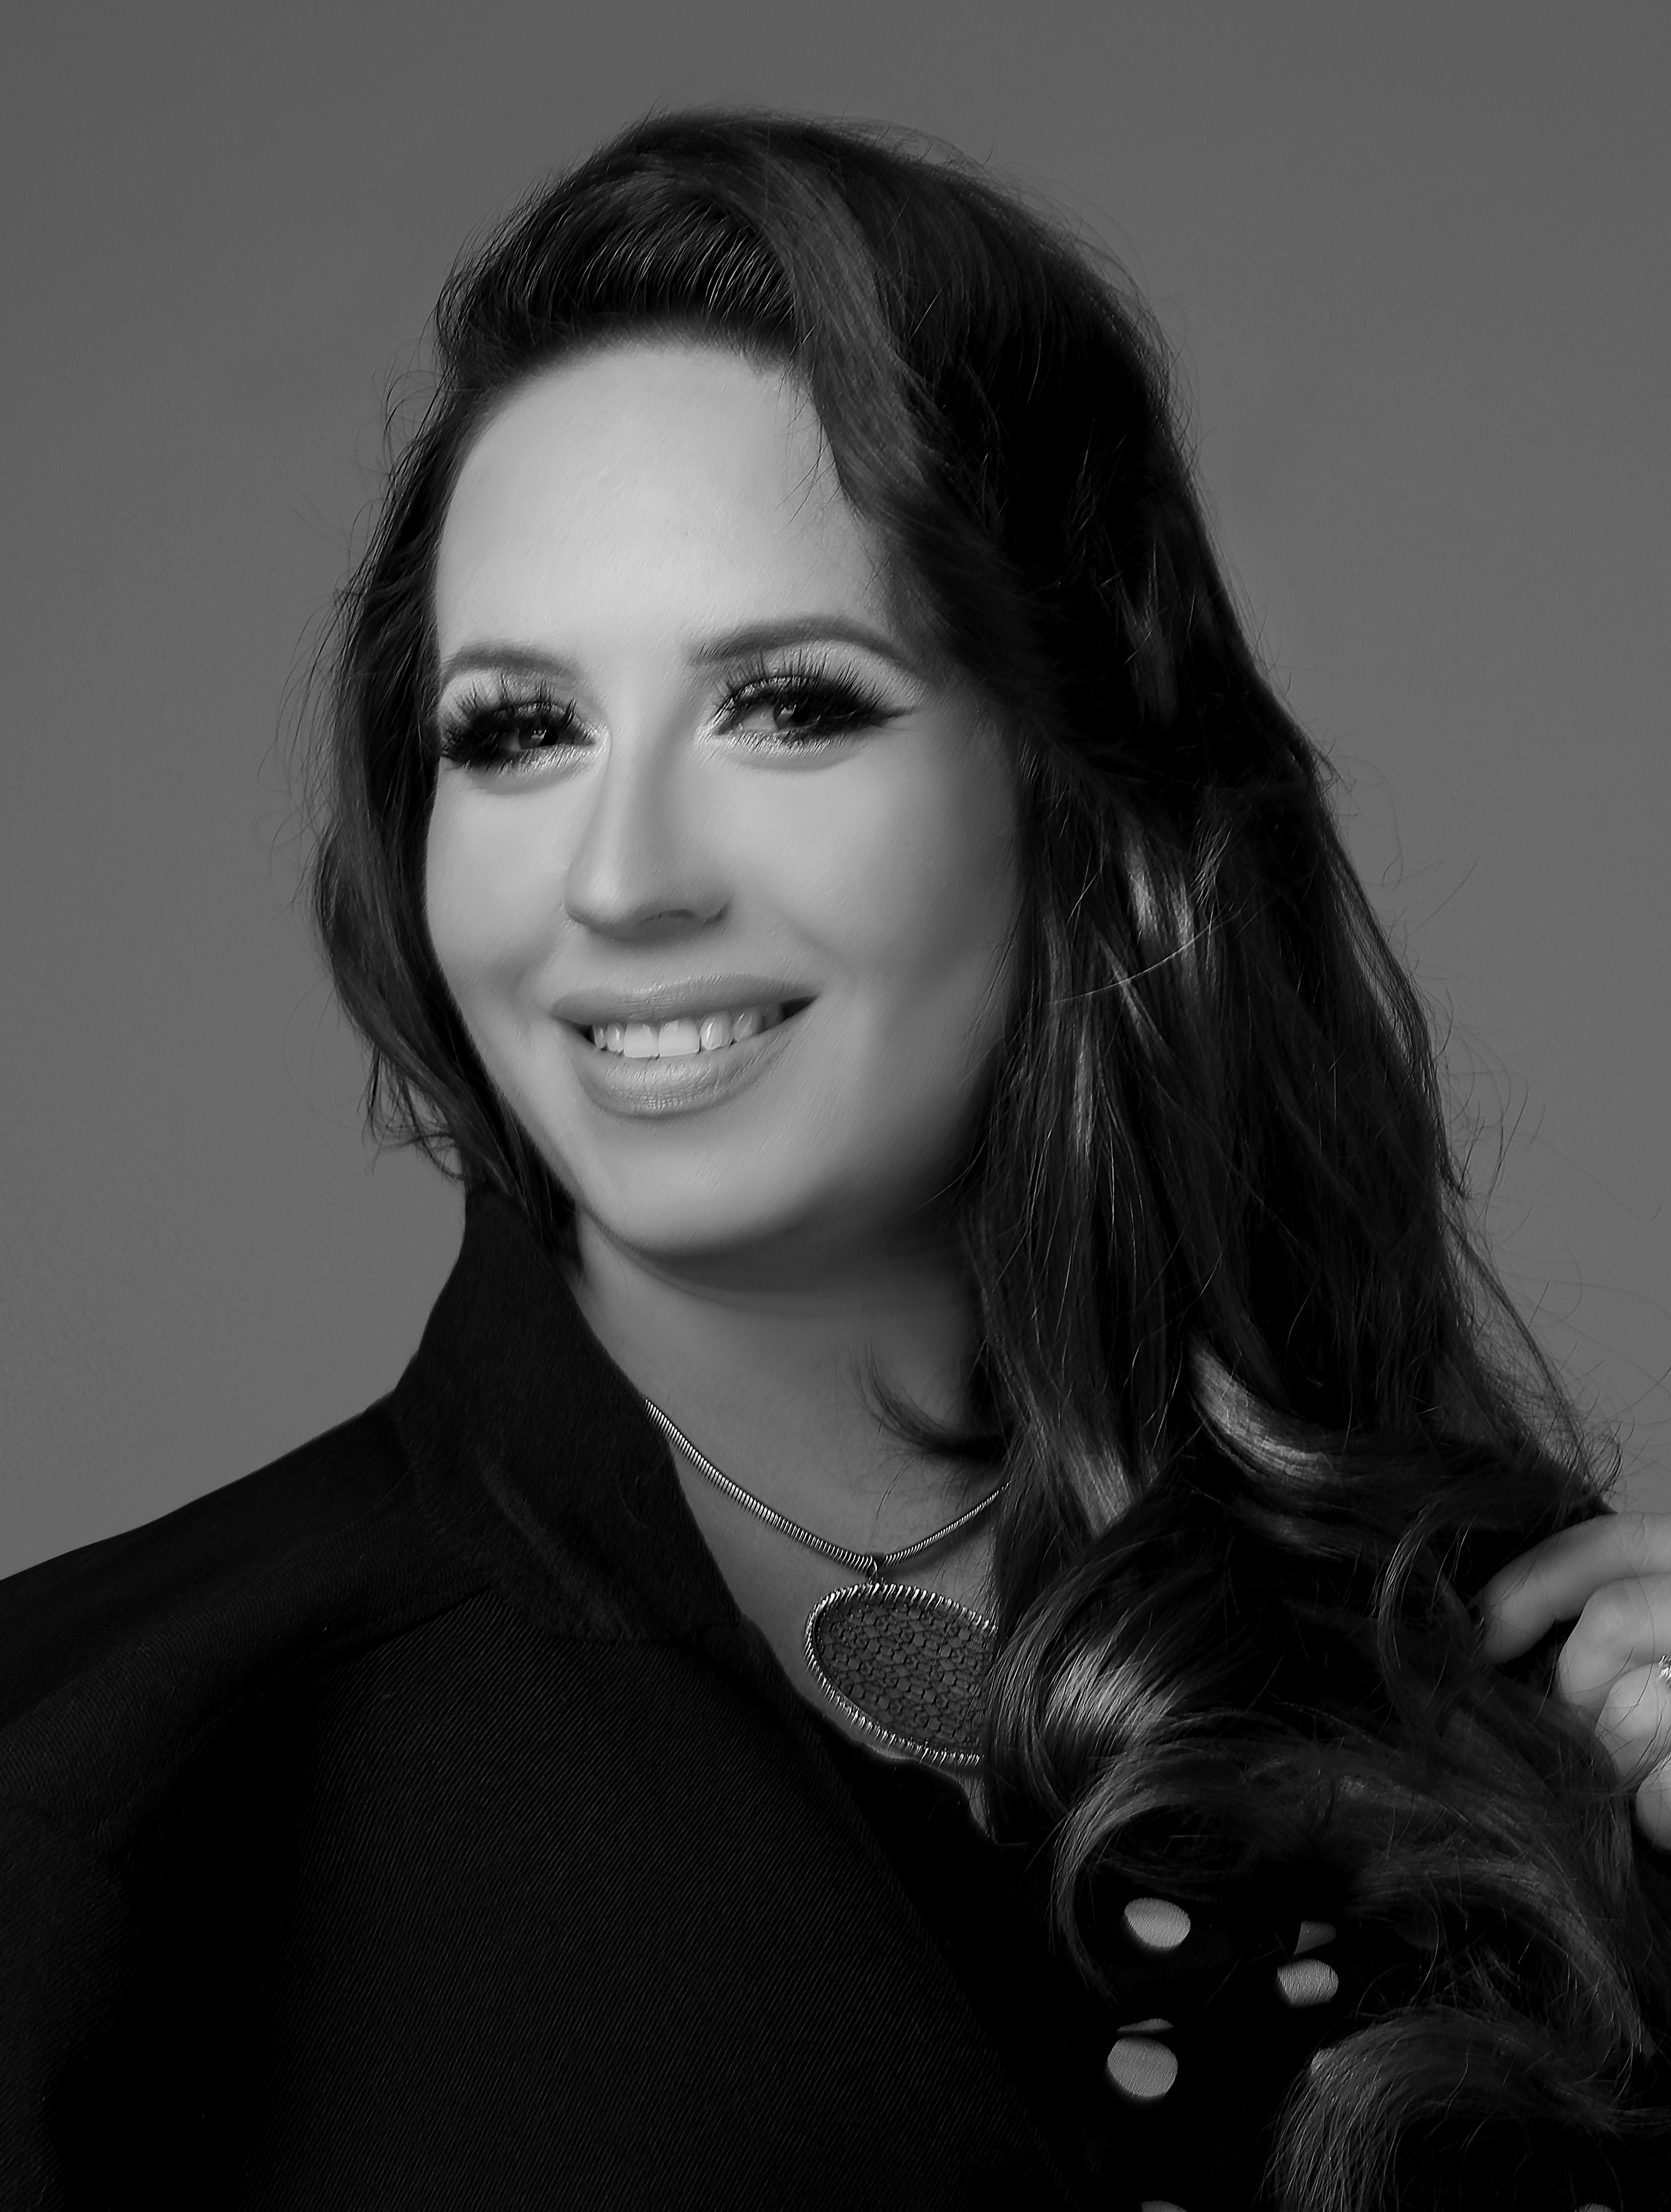 Catherine-Hawkes-Hair-Artistic-Director-Tips-Toes-2.jpg